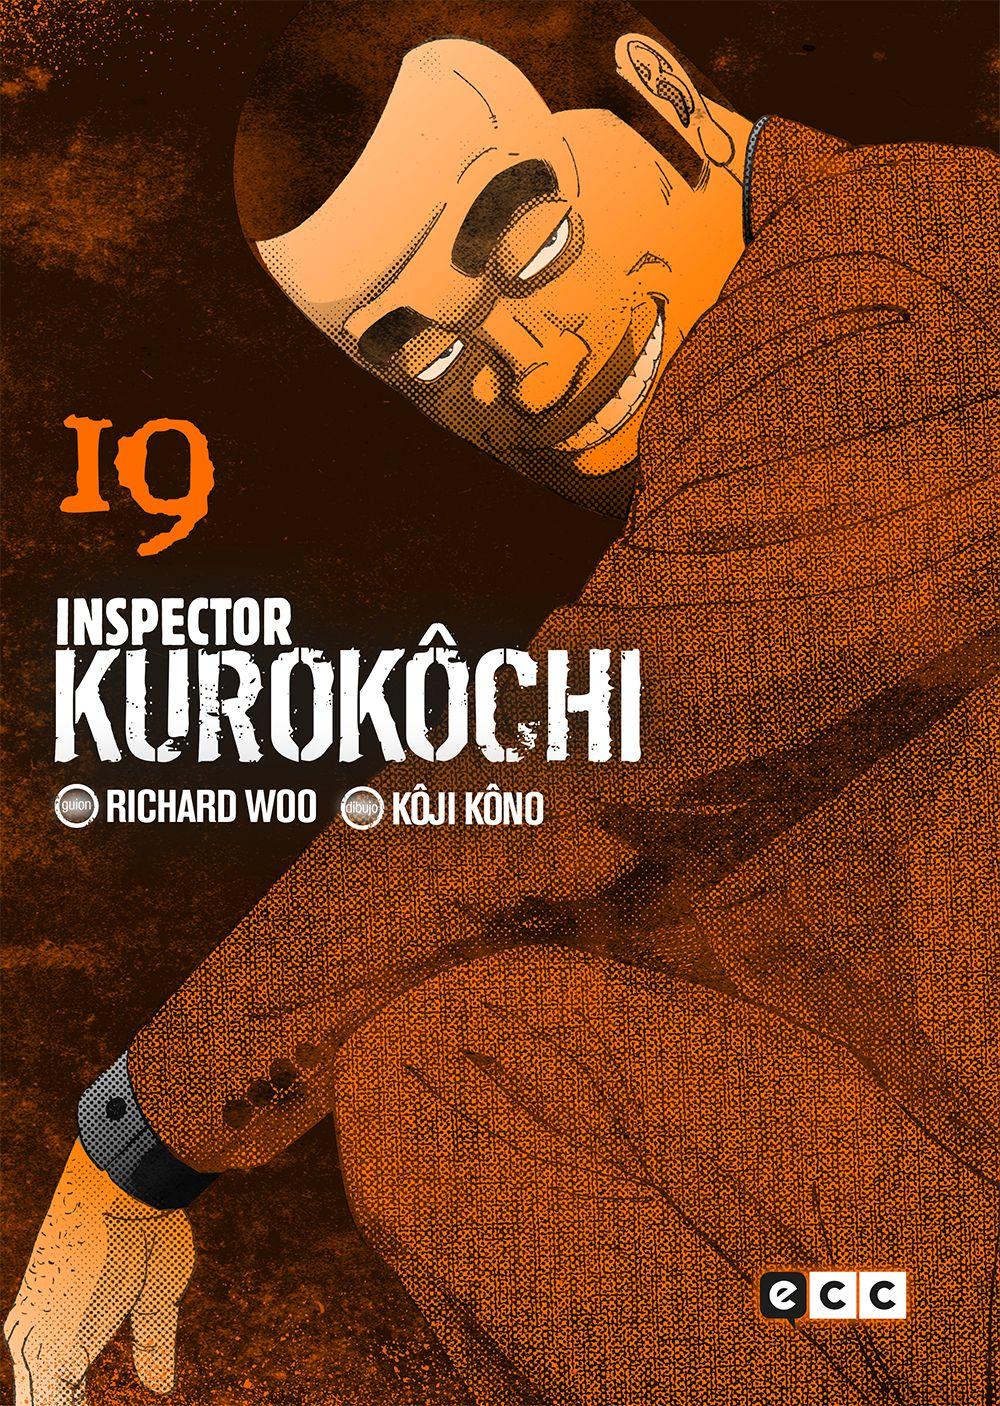 sobrecubierta_kurokochi_19_web